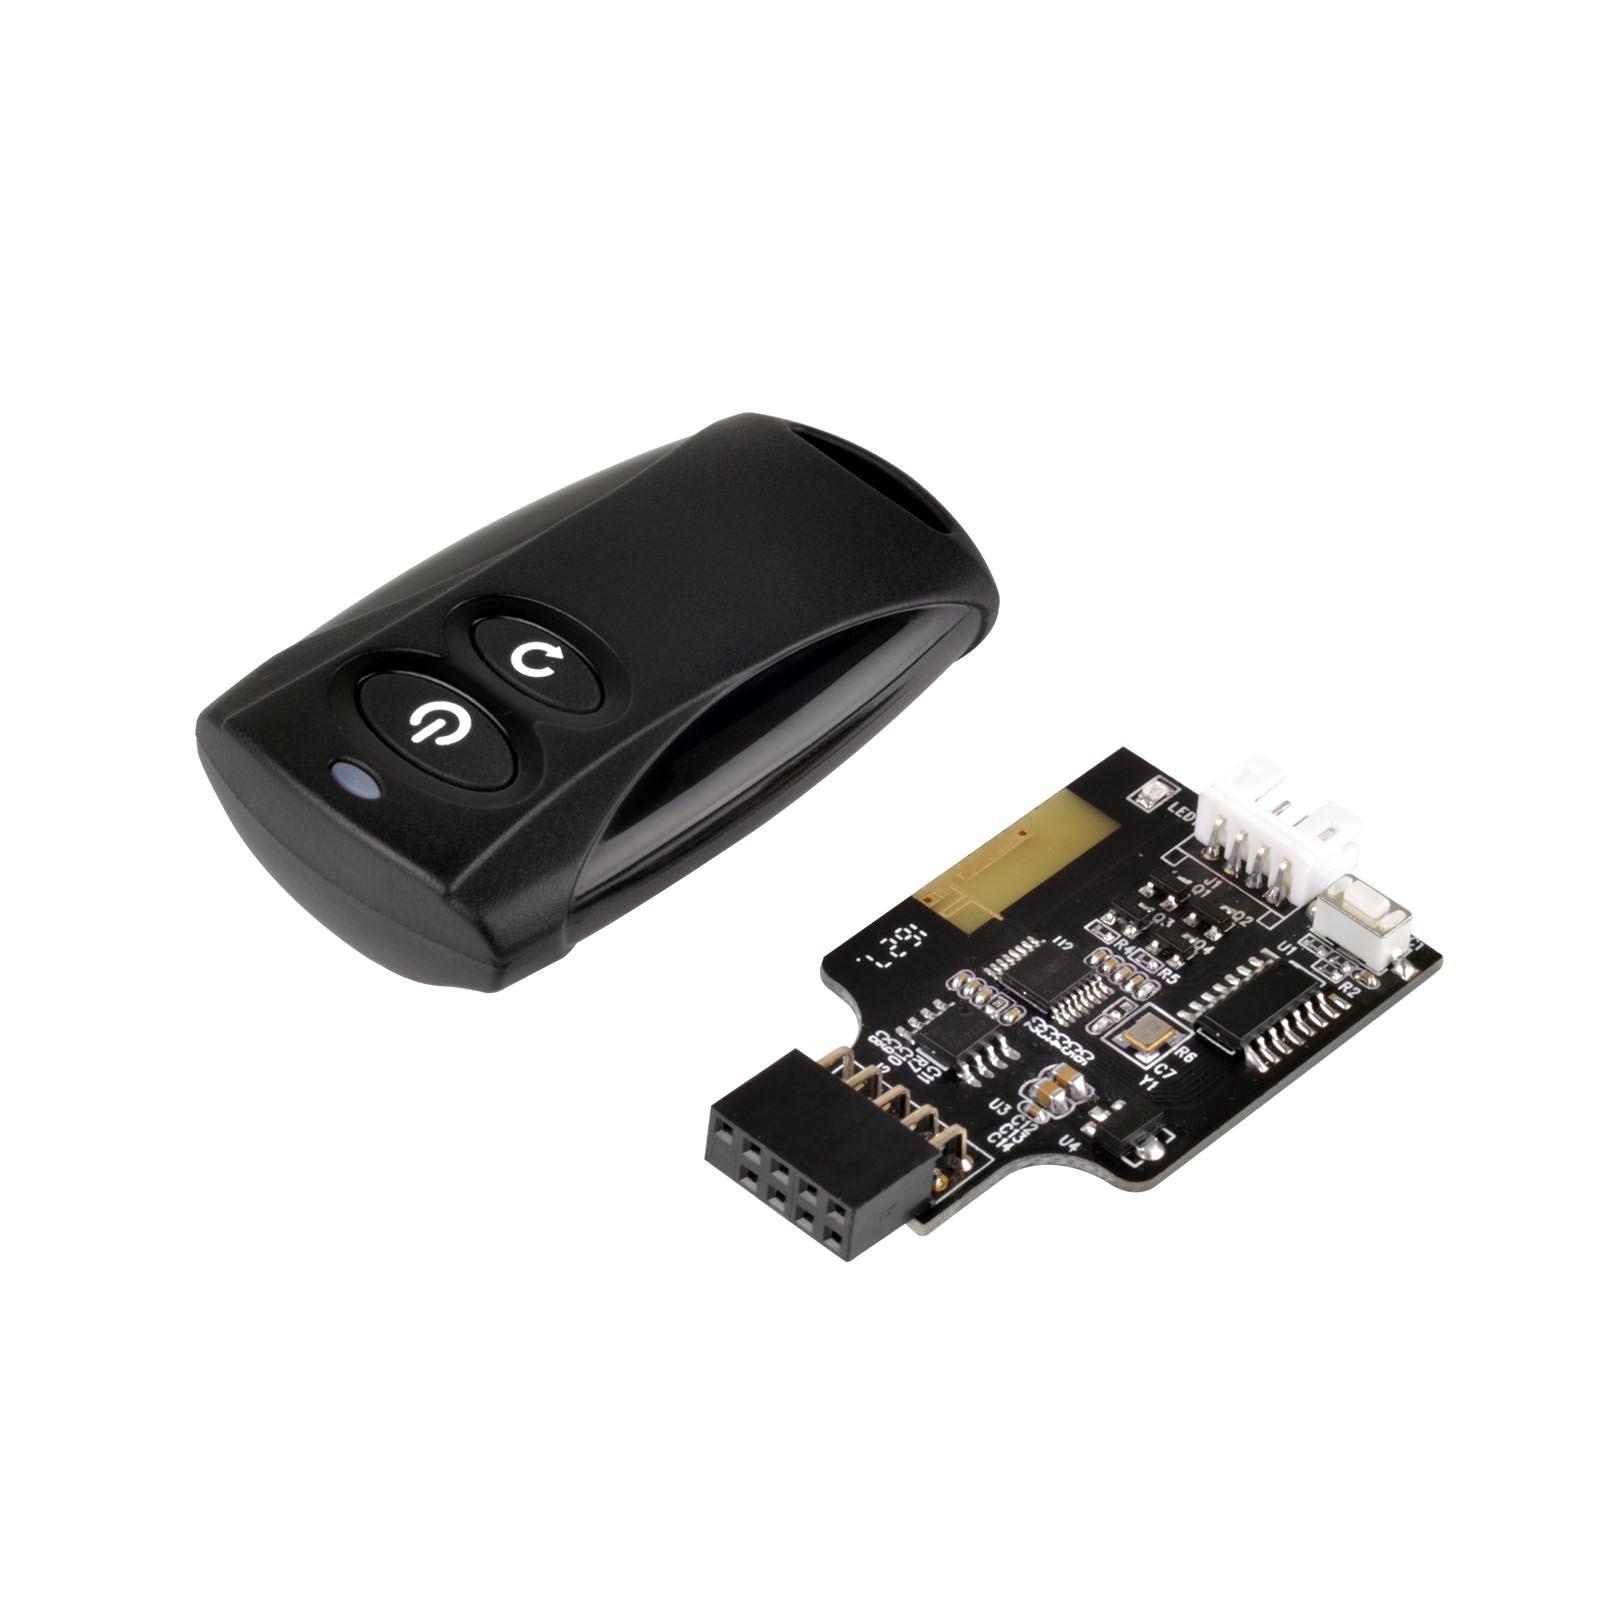 SilverStone Technology 2.4G Wireless Remote Computer Power/Reset Switch, USB 2.0 9-pin Interface ES02-USB by SilverStone Technology